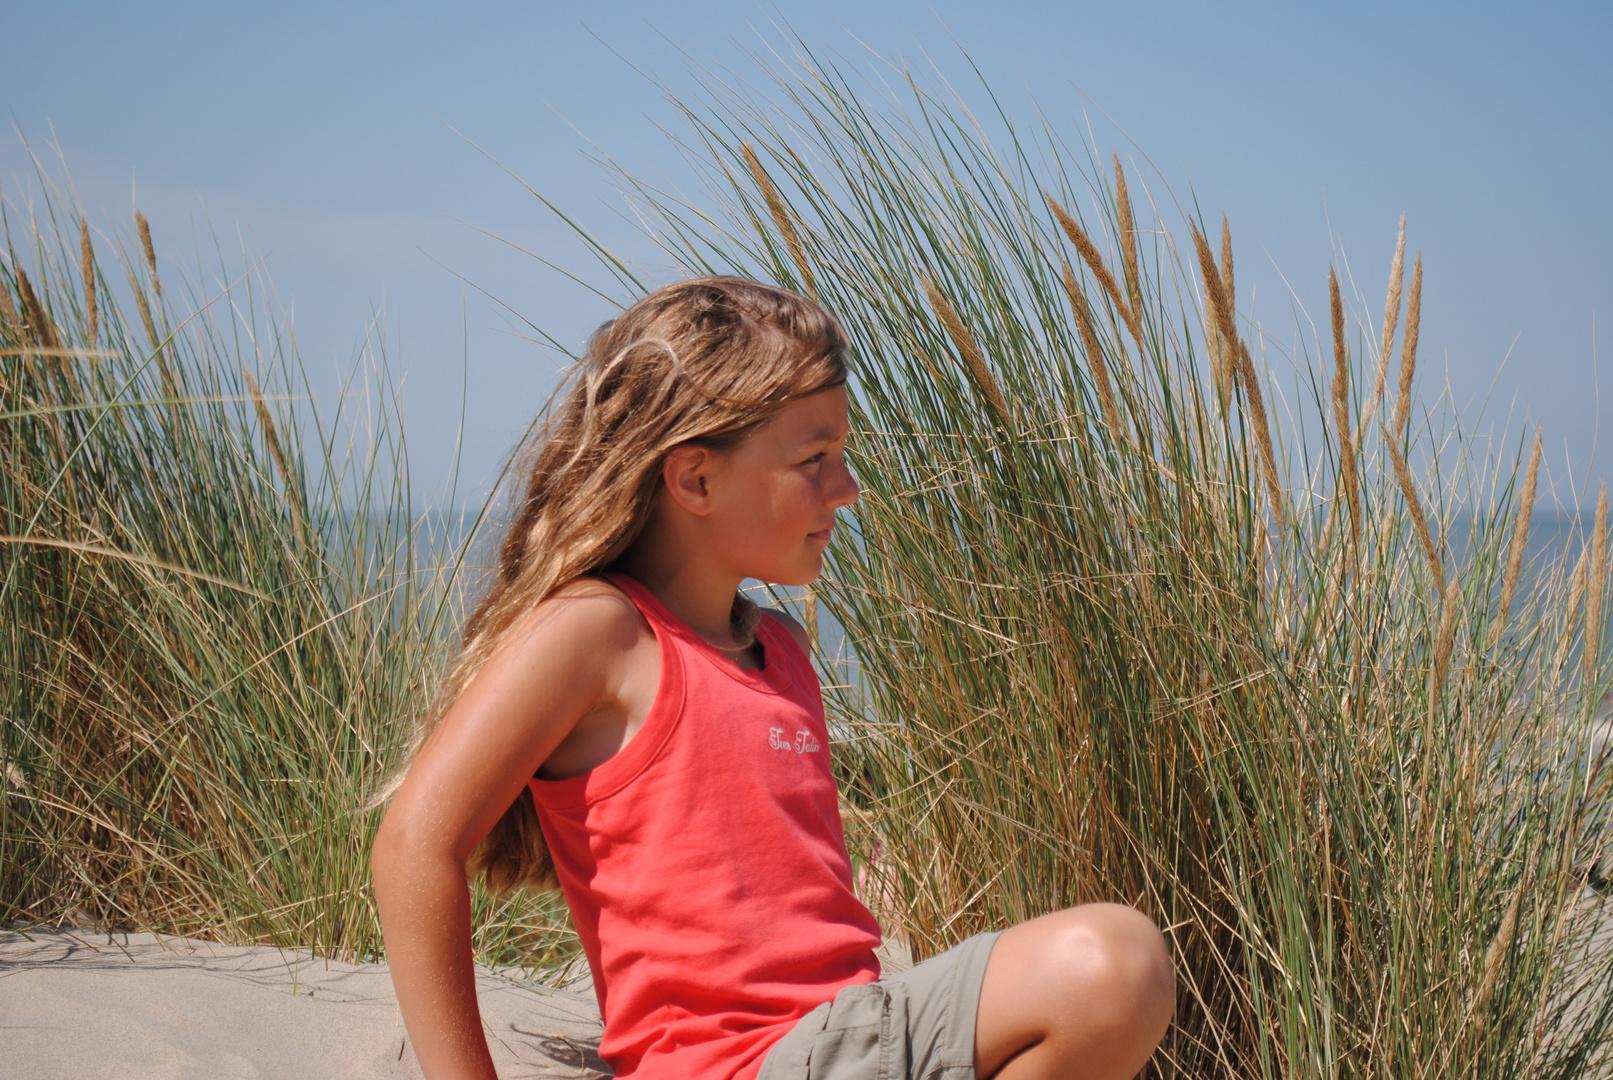 Shooting am Strand (Sarah)